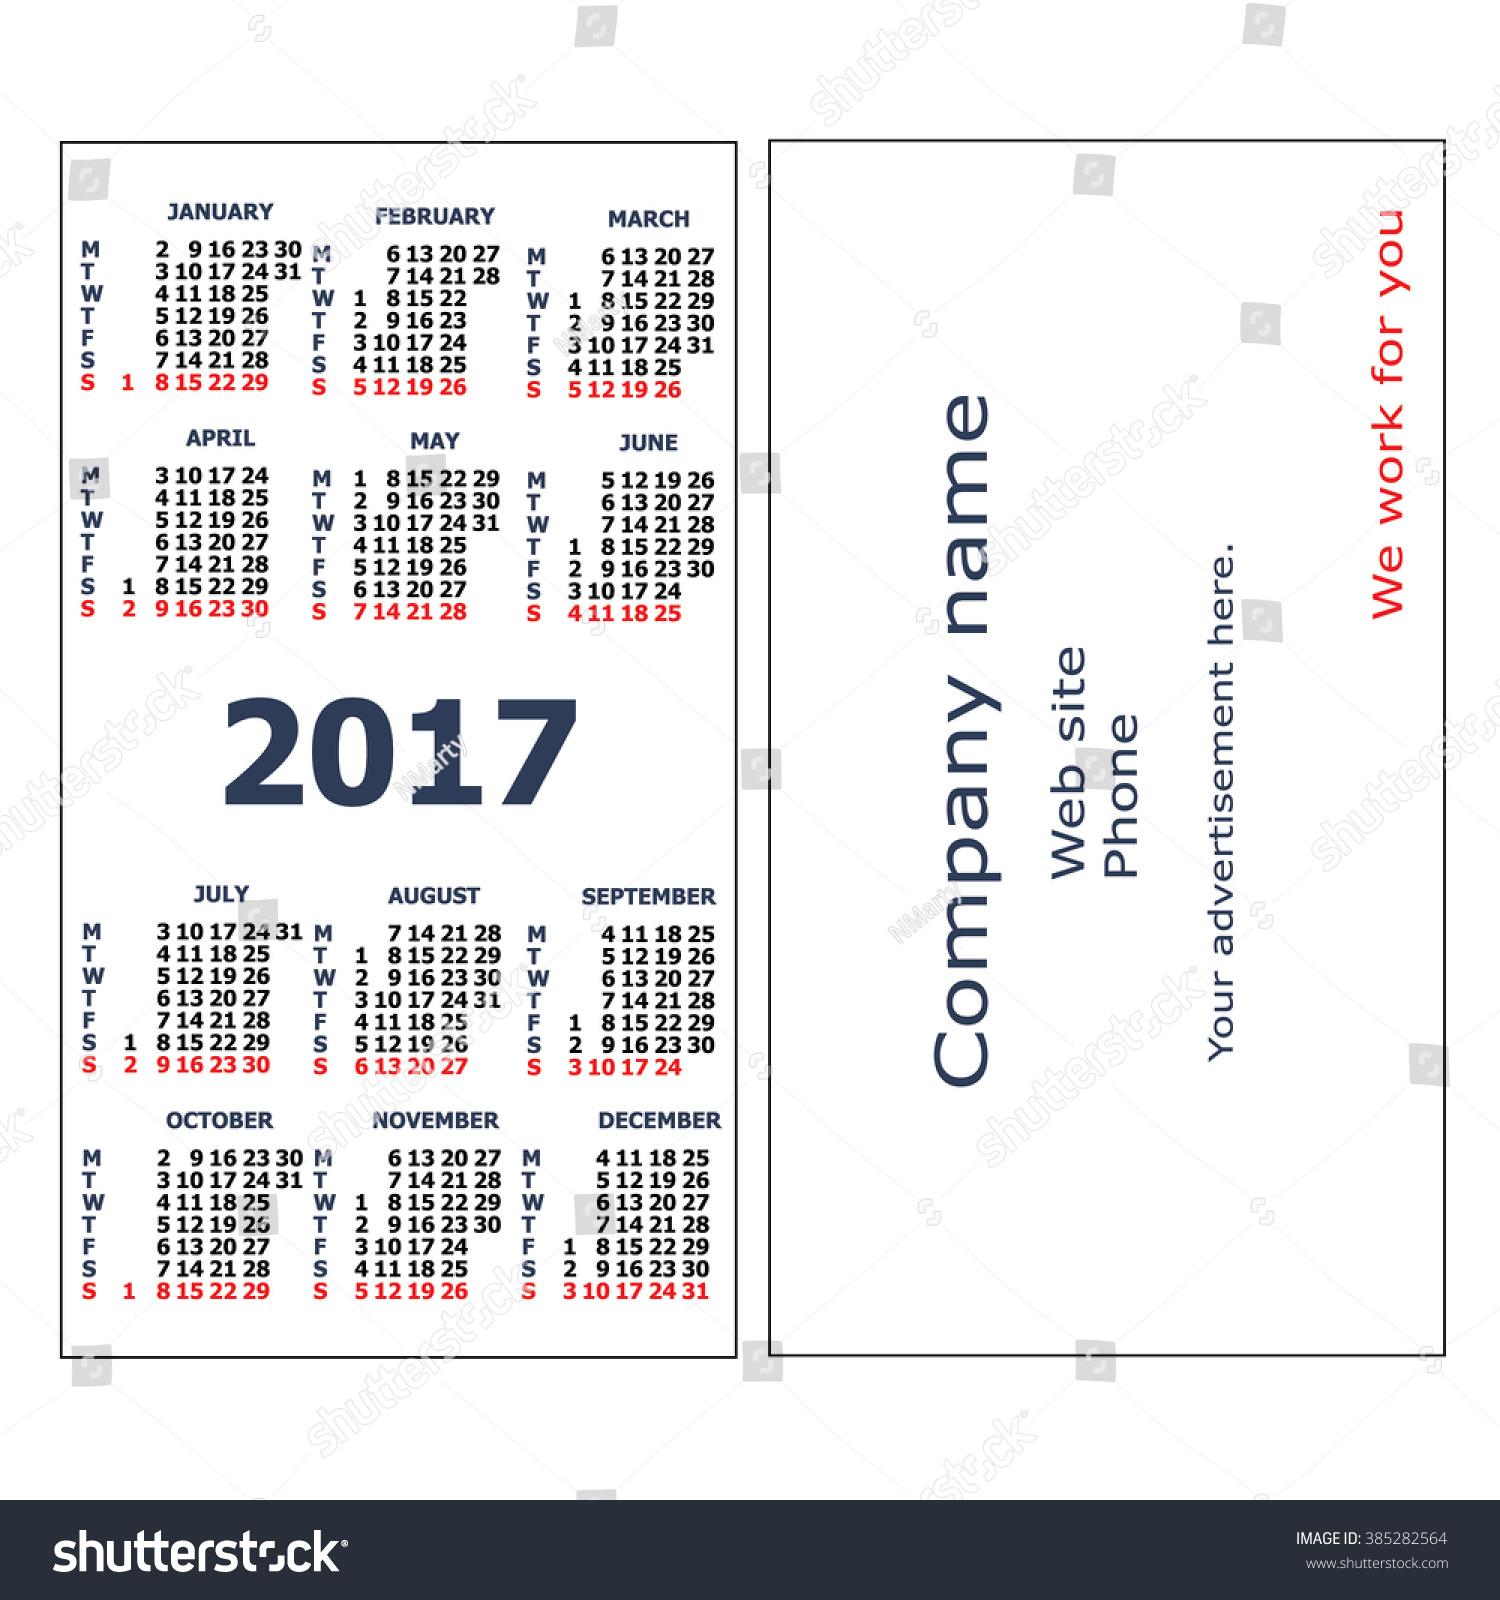 2017 Pocket Calendar Template Calendar Grid Stock Vector 385282564 ...